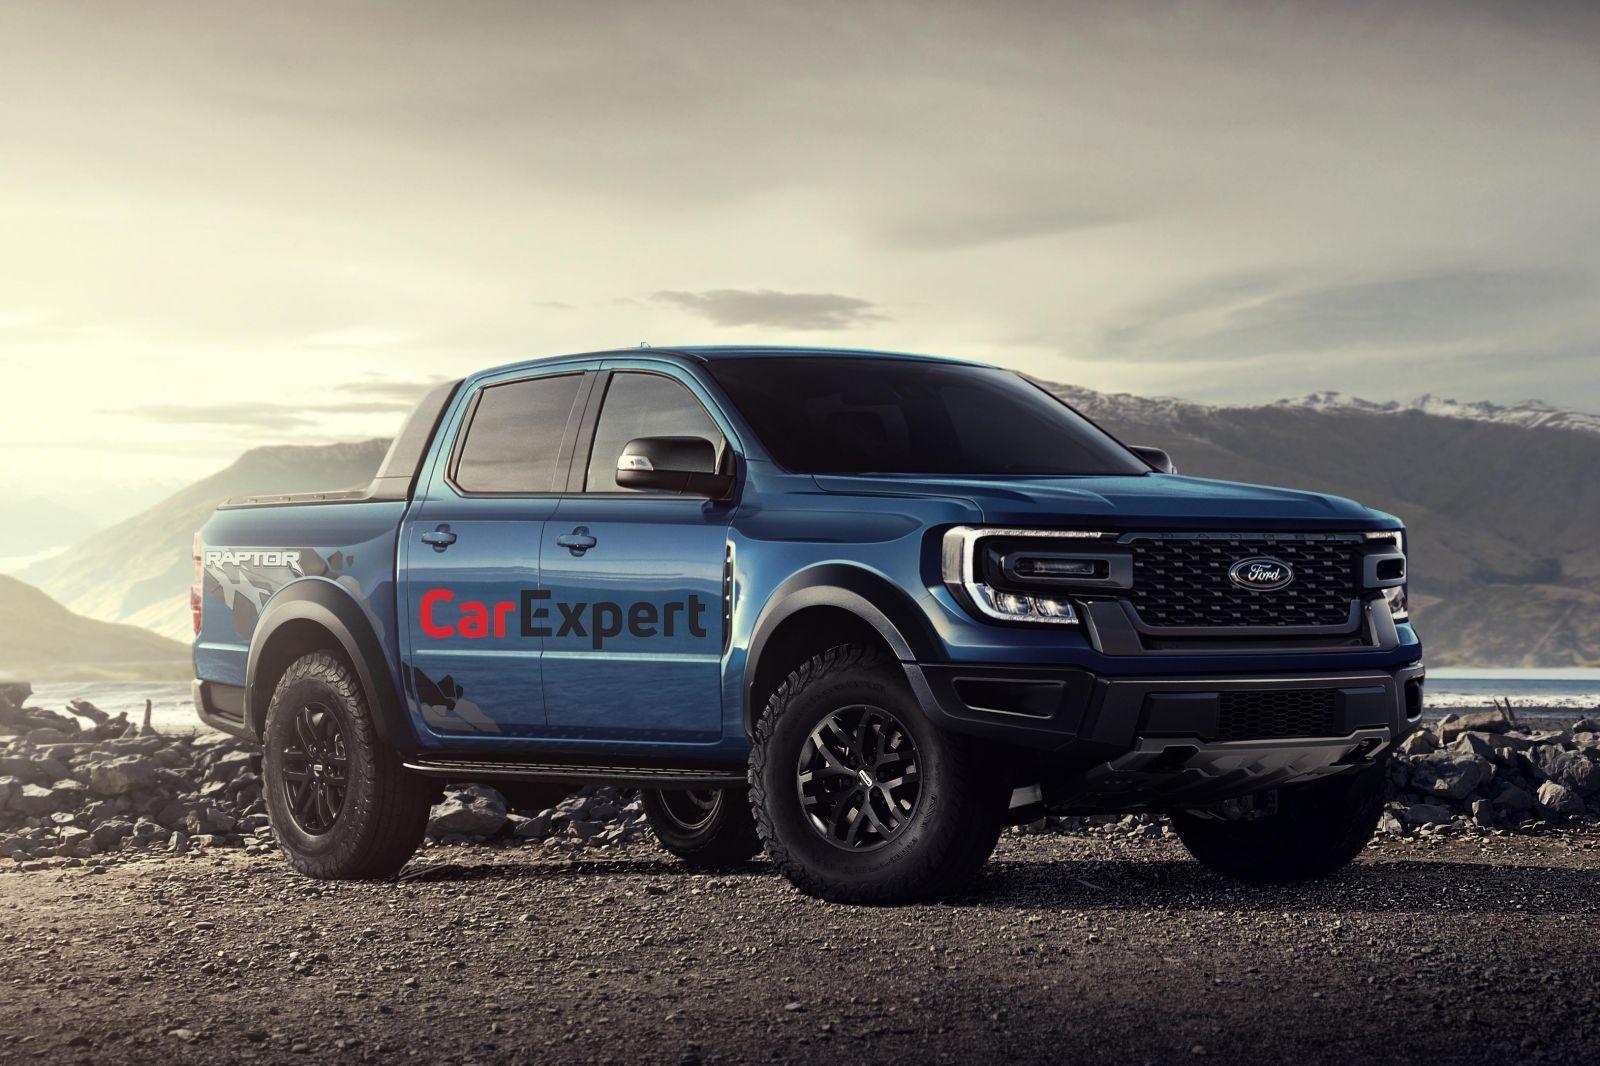 Report: Ford Ranger Raptor Gets A 325-Hp V6, Fox Shocks; May